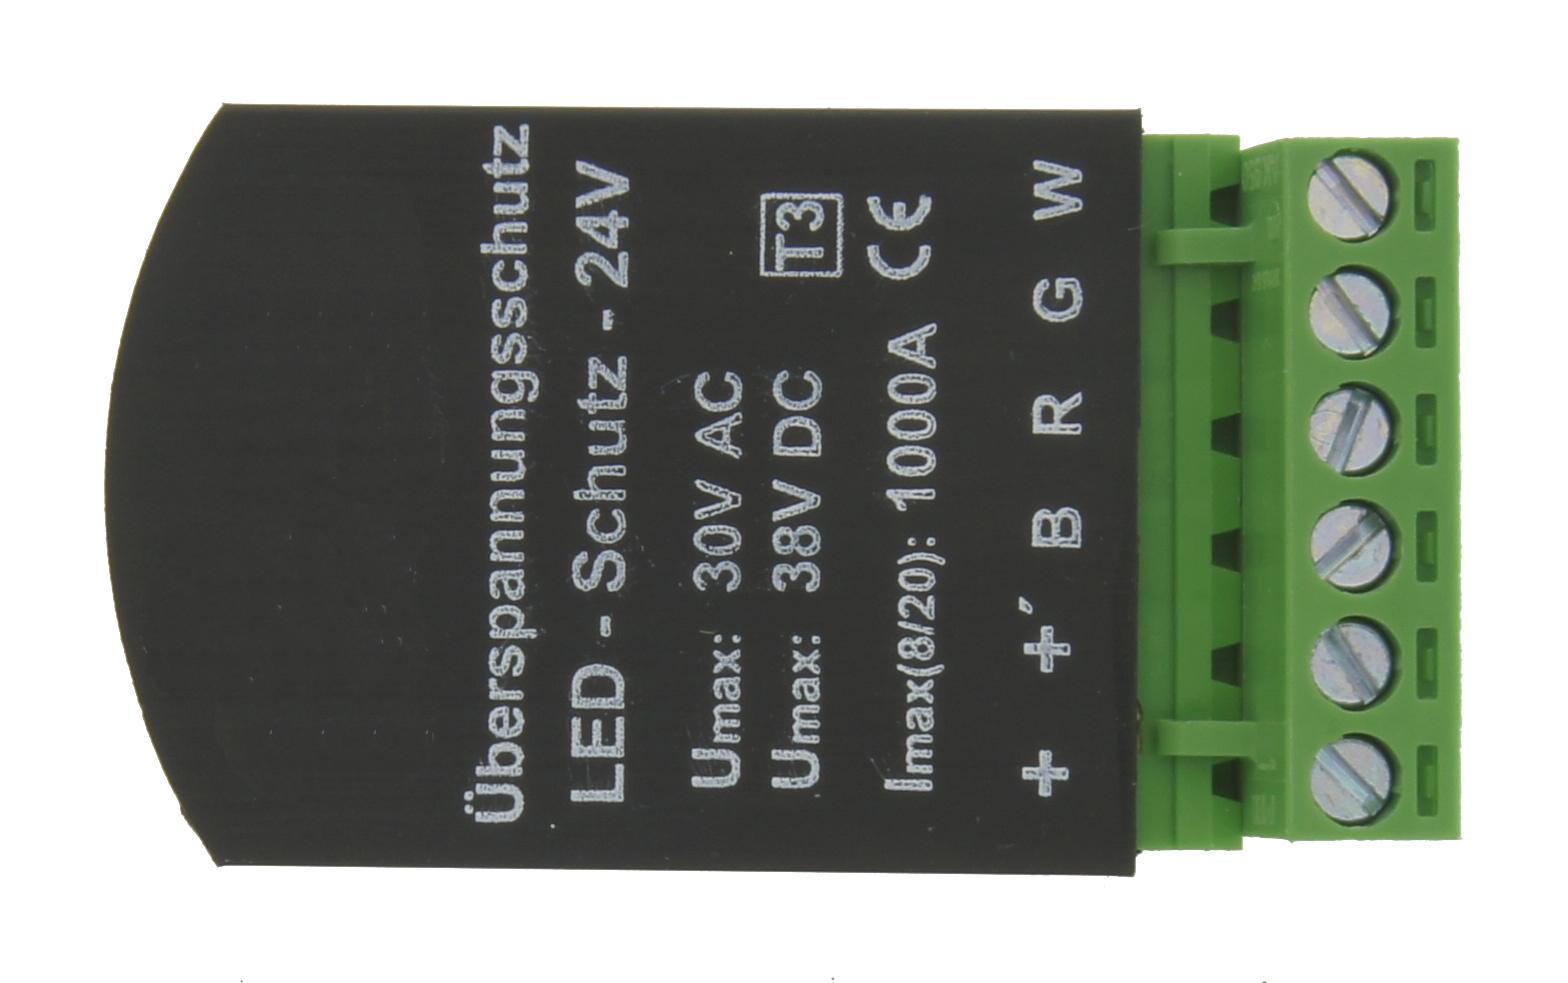 1 Stk Ãœberspannungsschutz 24V für DW, RGB, RGBW Strips LINZ024004